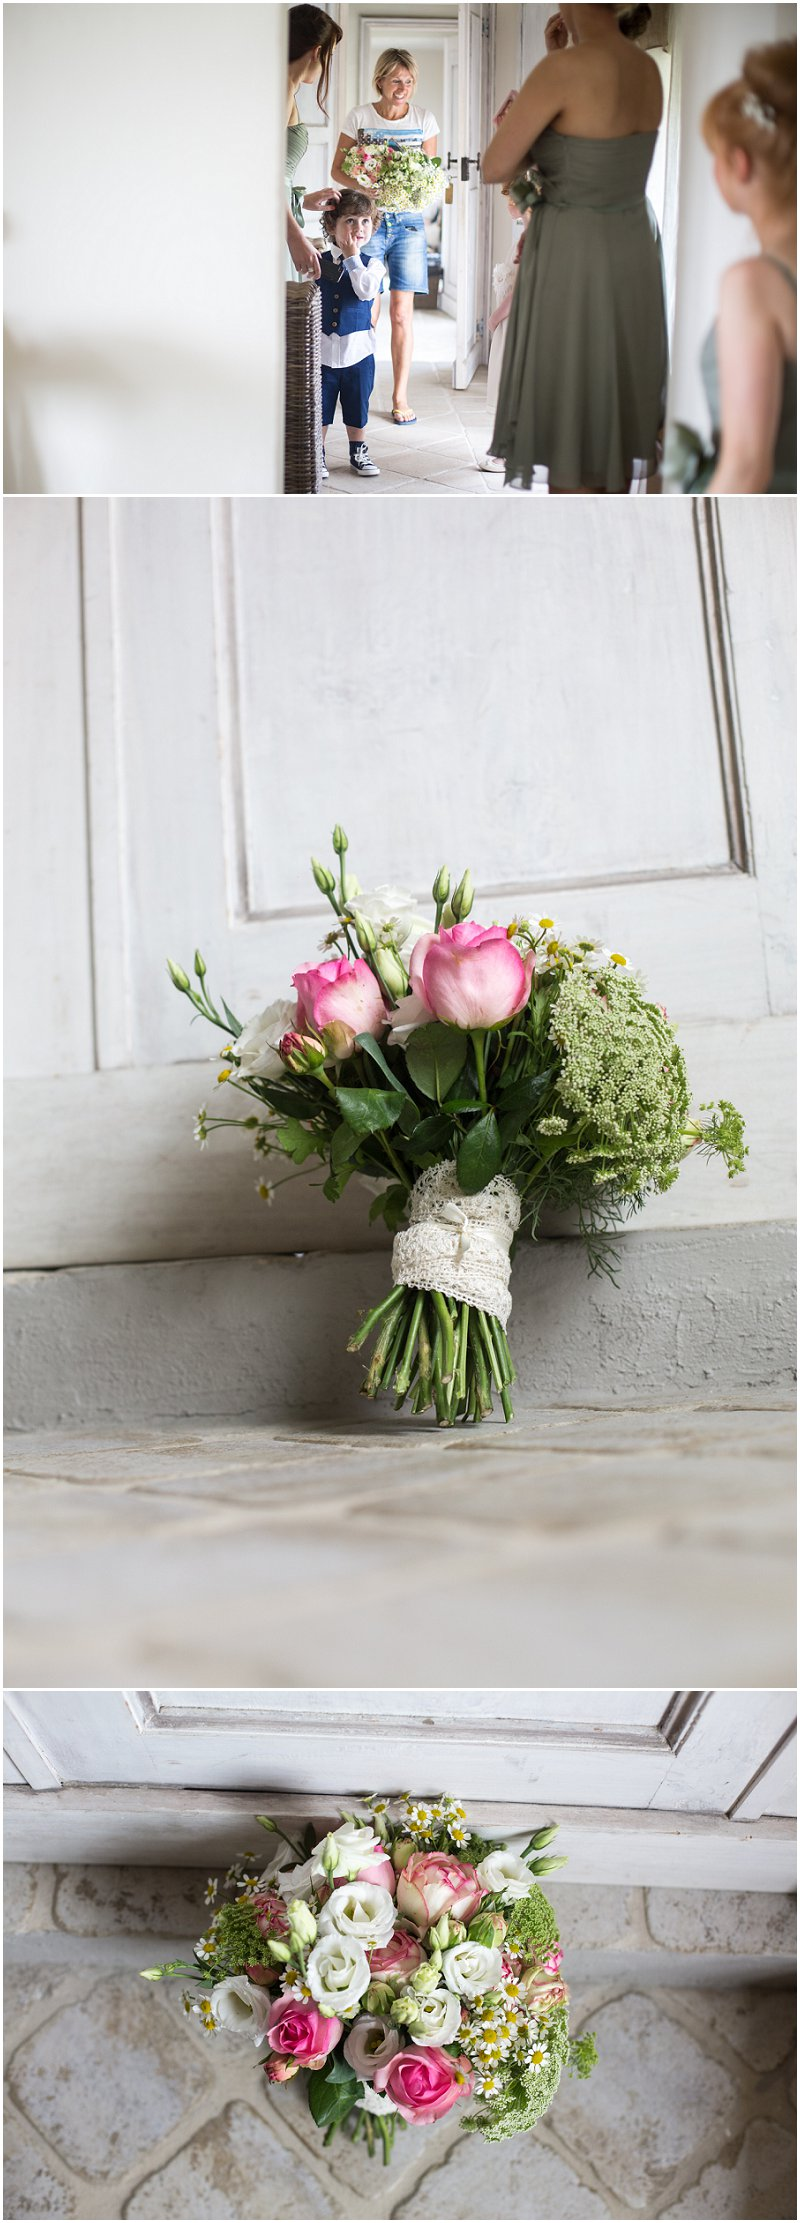 Wedding flowers arrive at La Villa, Piedmont Italy